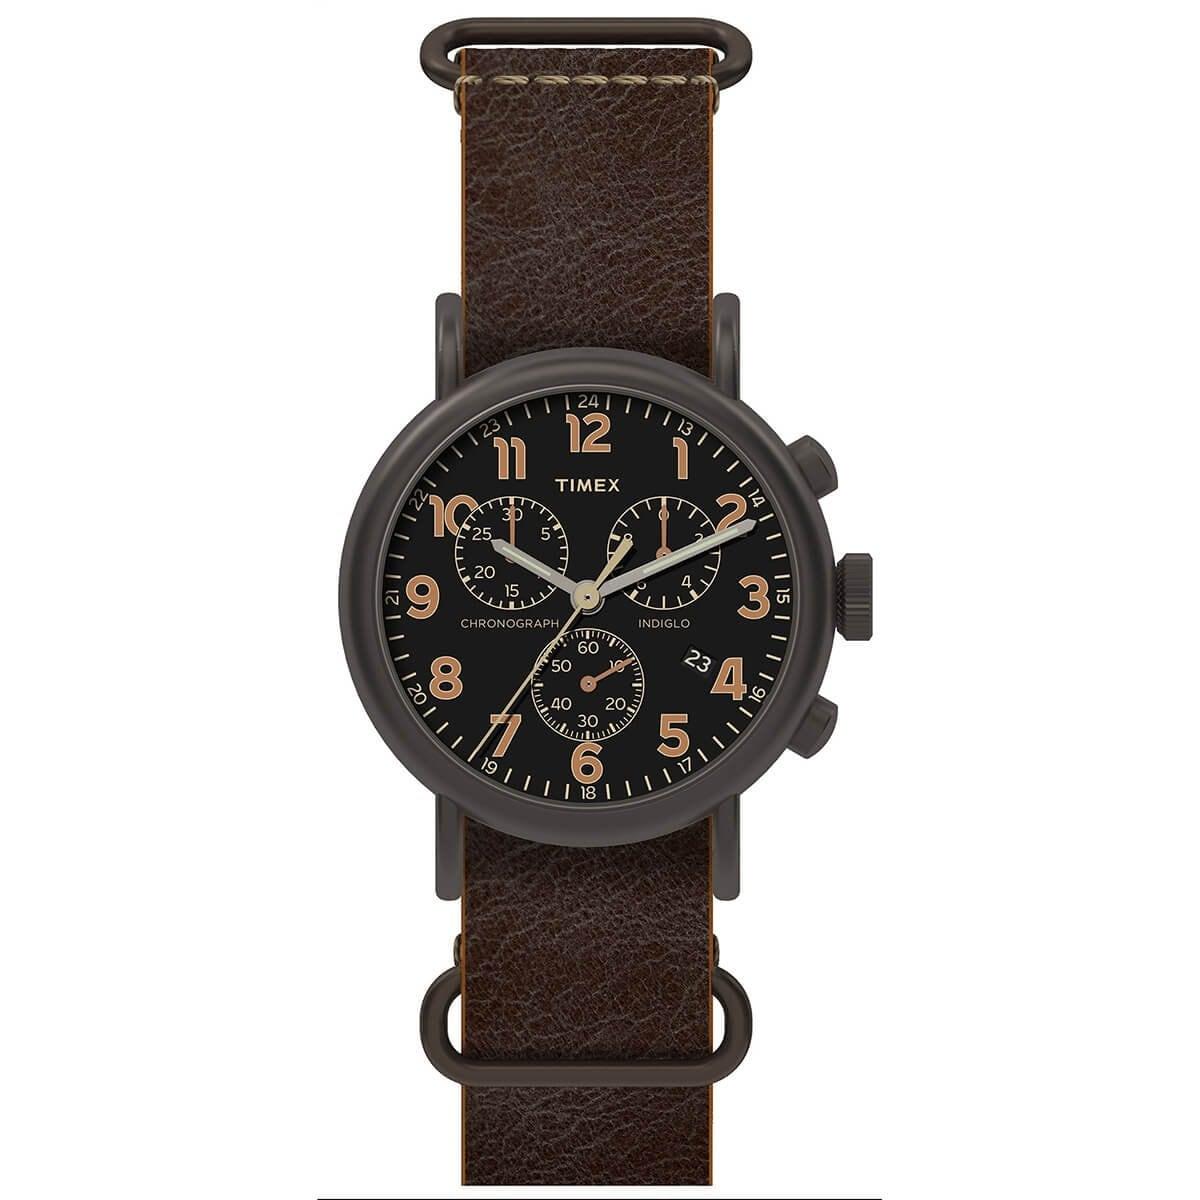 Reloj caballero timex tw2p85400 ac52efc52fb4